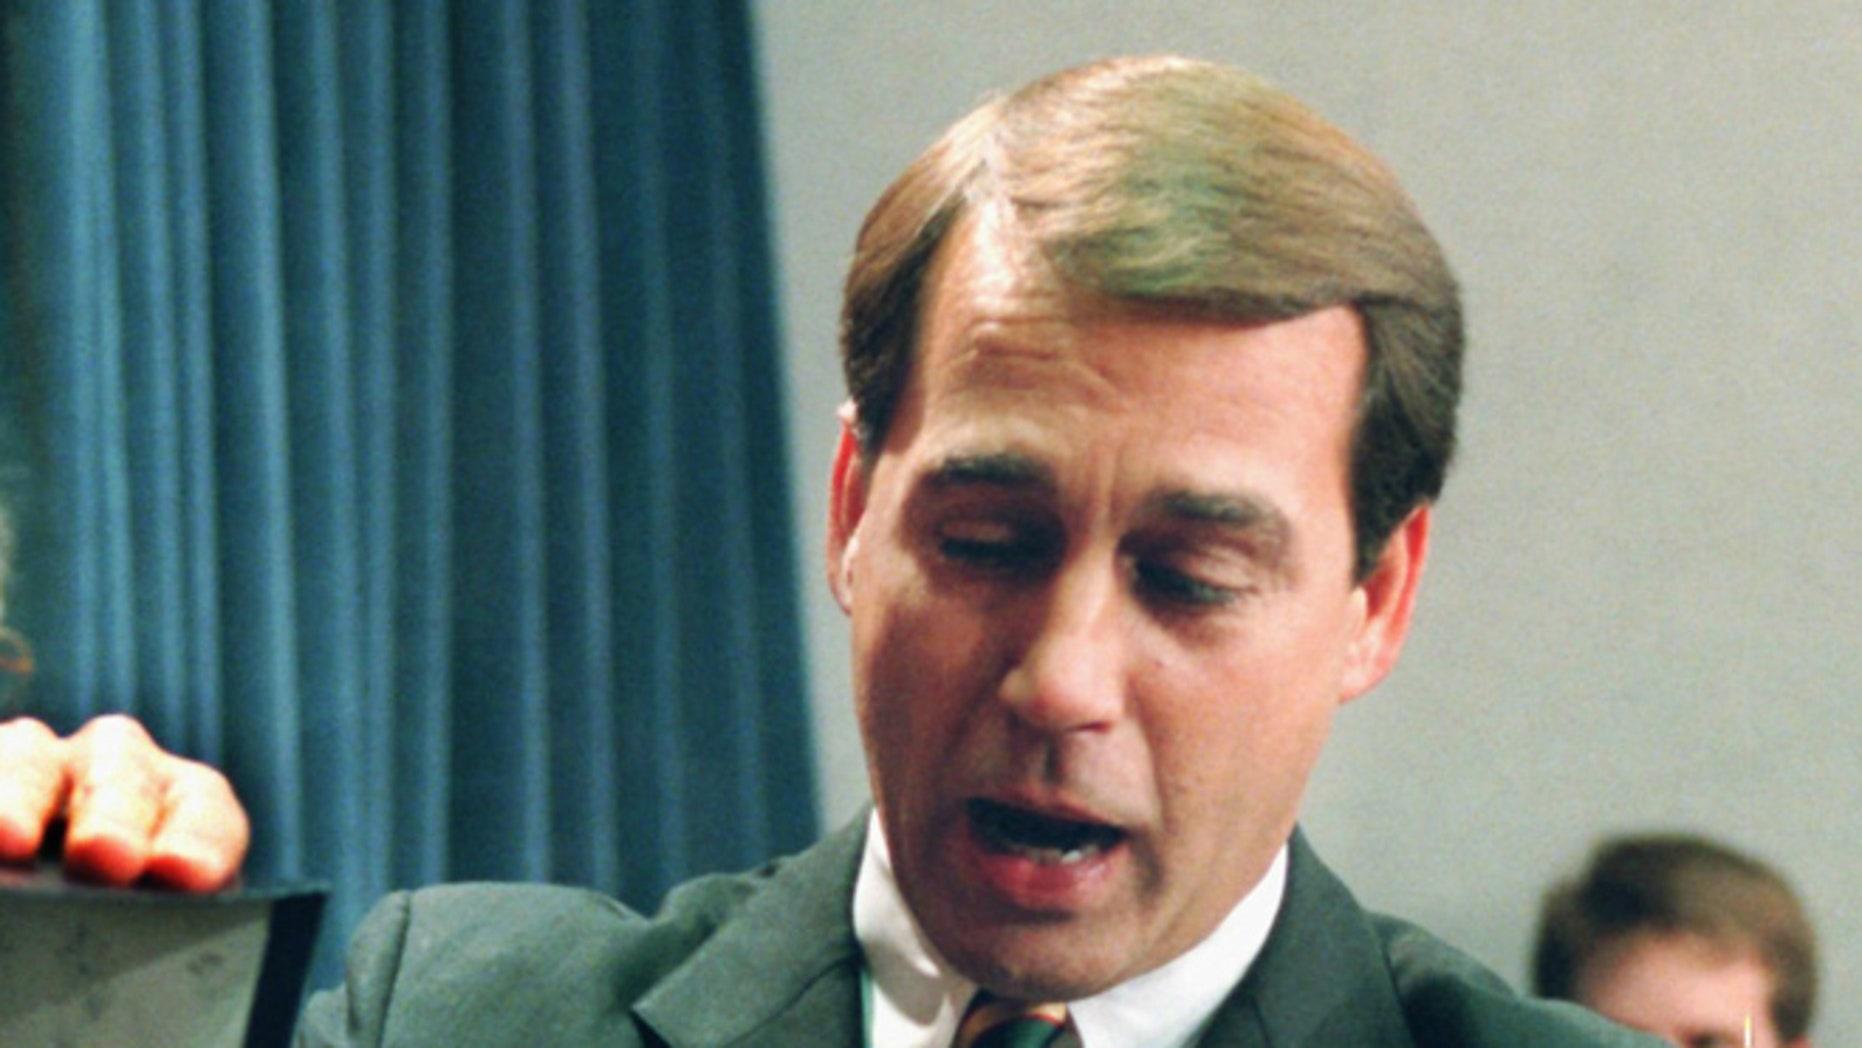 FILE: Dec. 21, 1995: Ohio Rep. John Boehner on Capitol Hill, Washington, D.C.